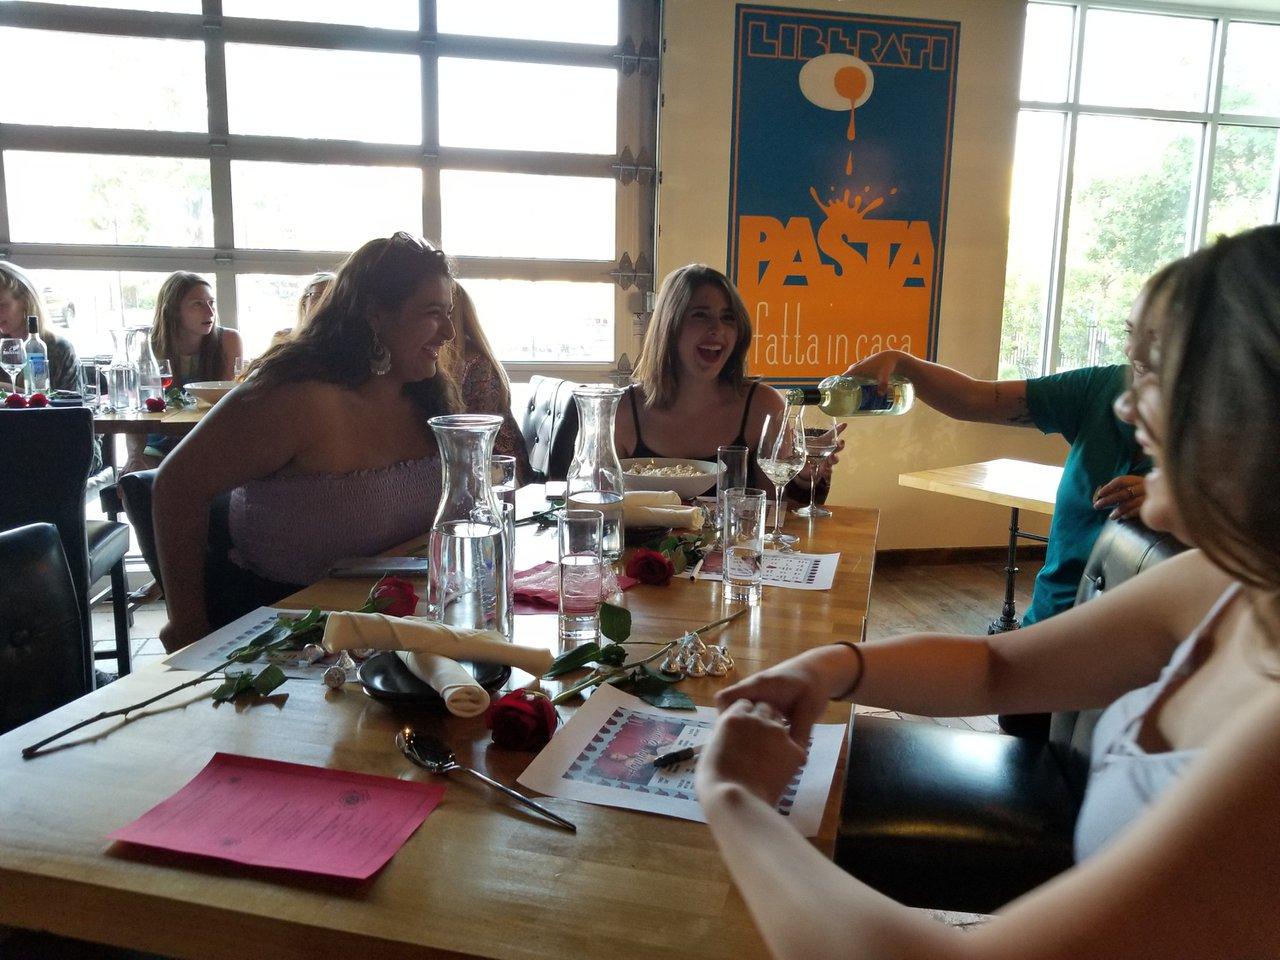 The Bachelorette Finale Watch Party photo Liberati_Girls laughing.jpg